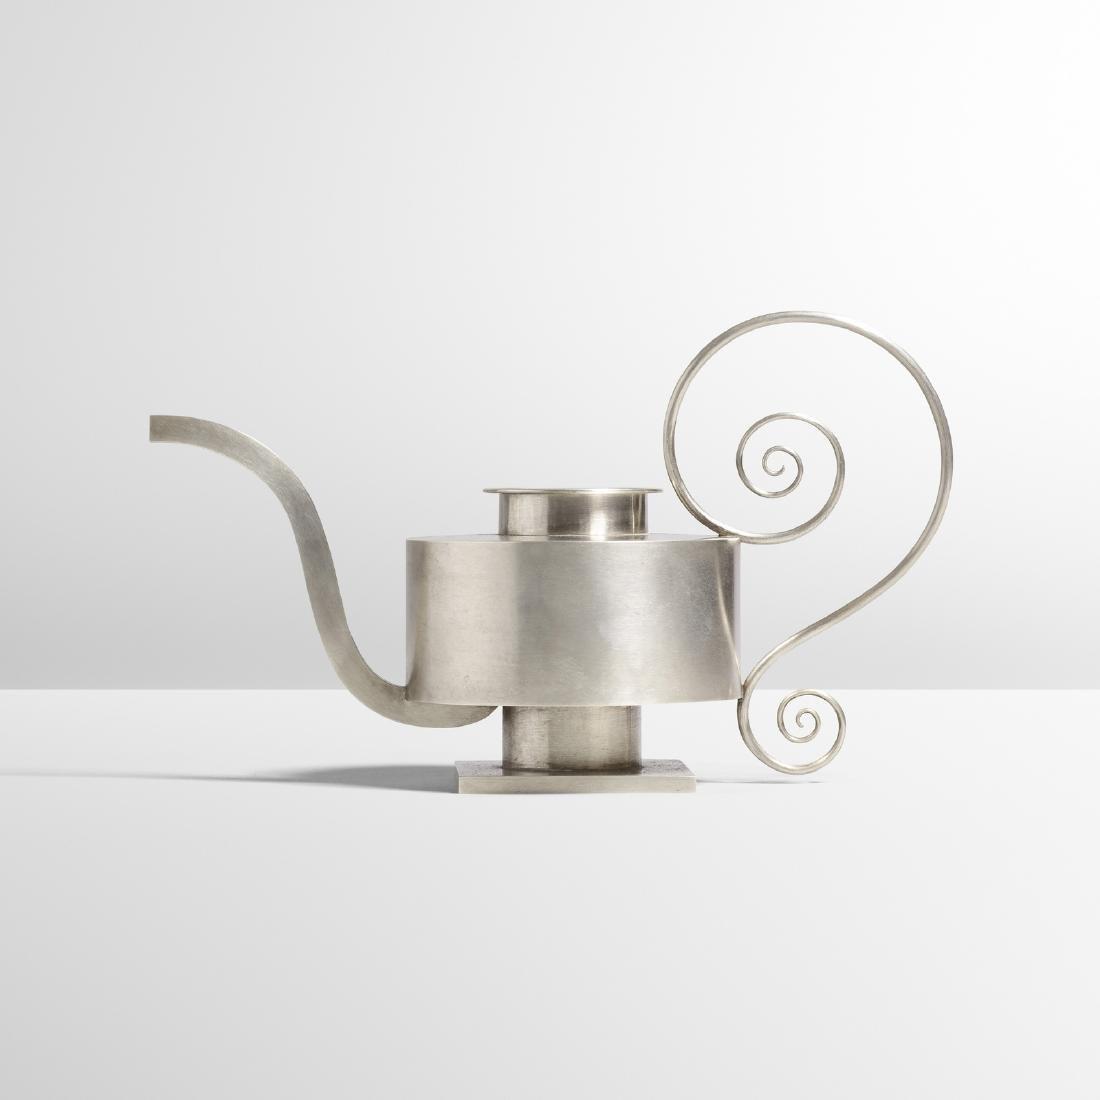 John Prip, Experimental teapot